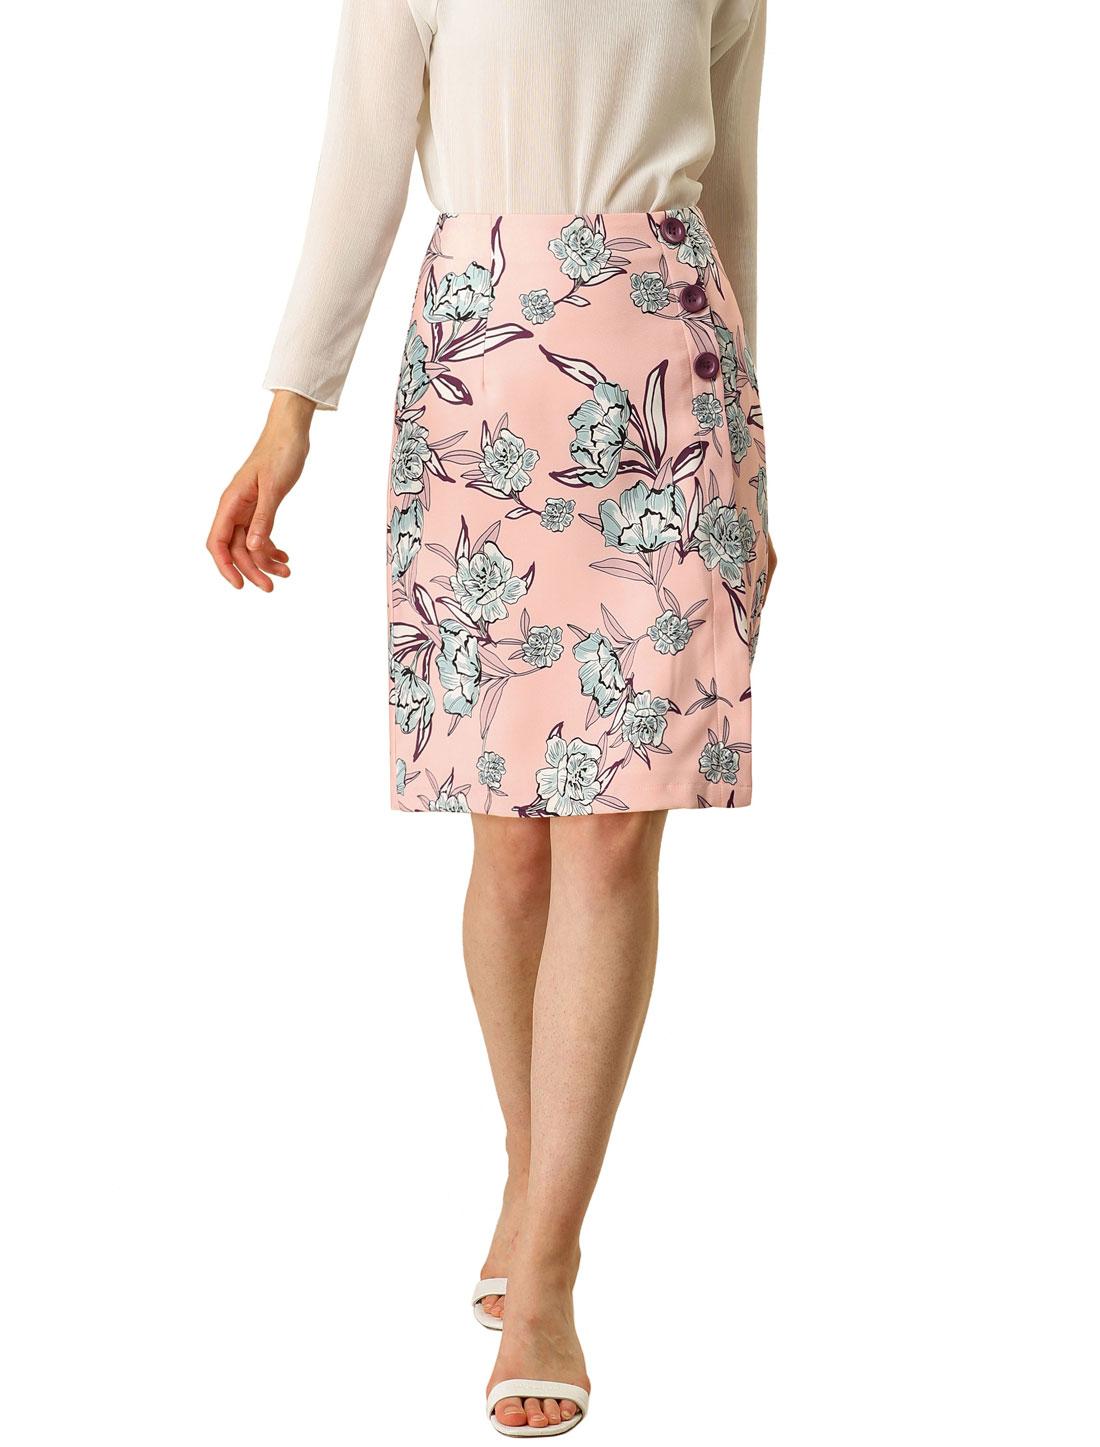 Allegra K Women's Work Elegant Floral Button Decor High Waist Skirt Pink S